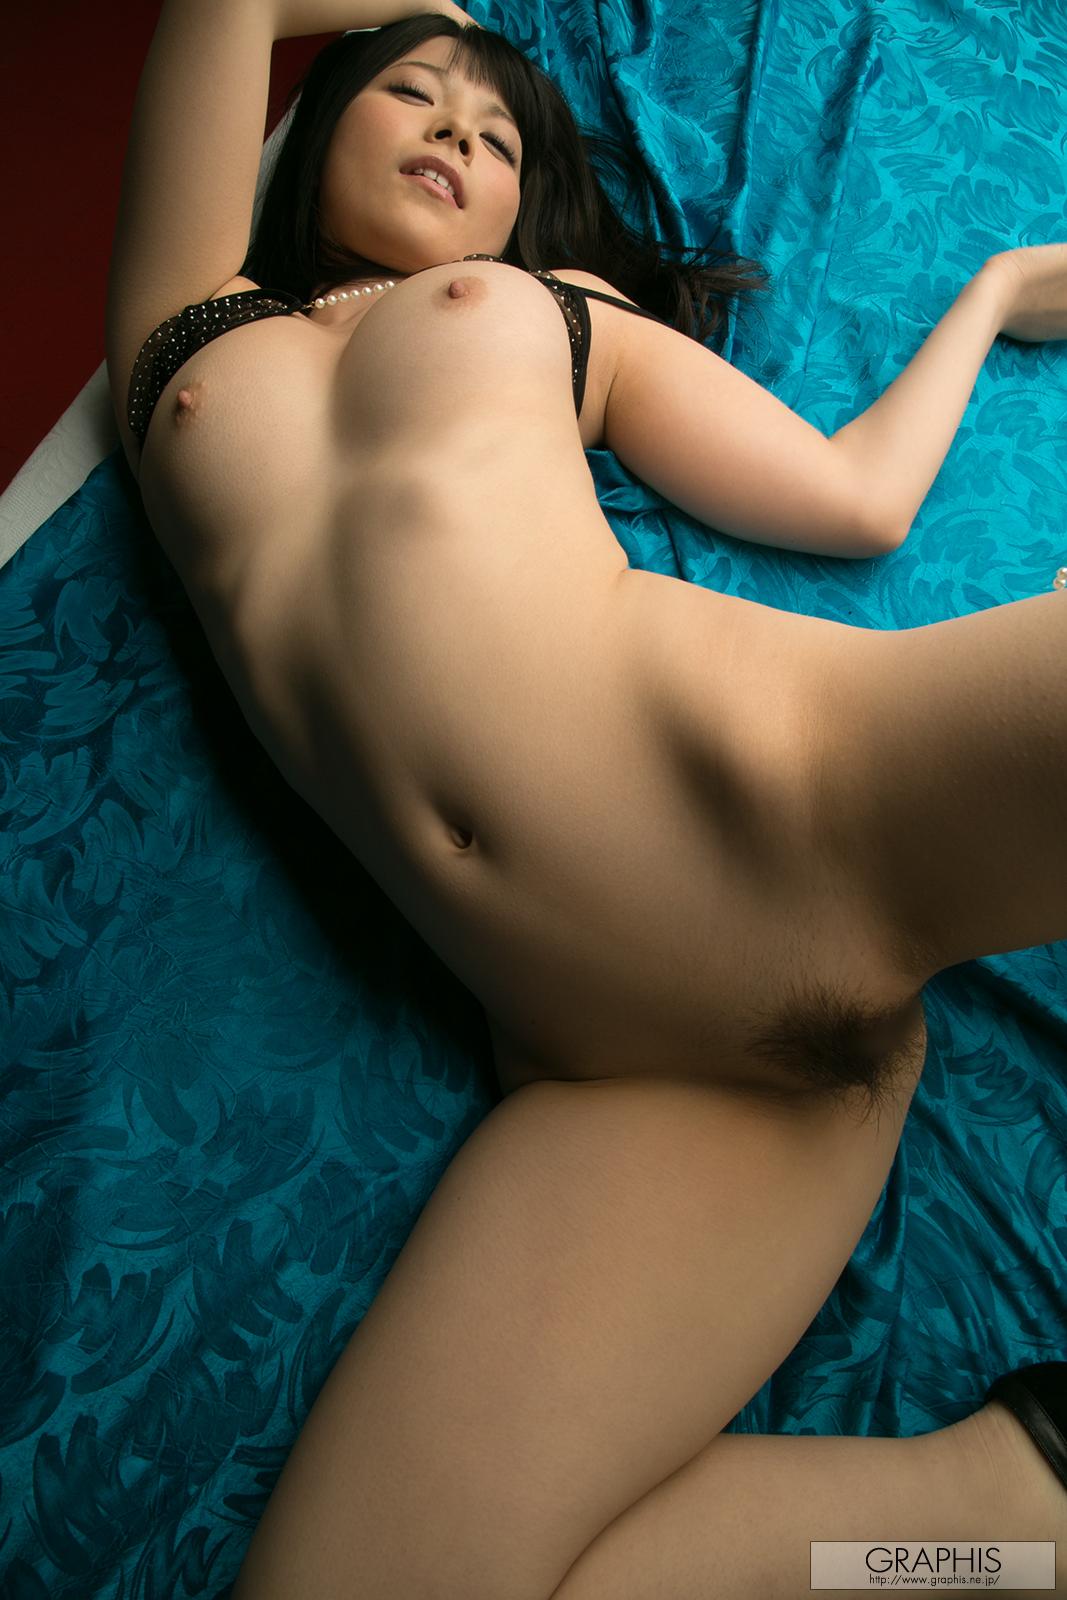 image http://scanlover.com/assets/images/272-nFWn8xEekOmrCVcG.jpeg